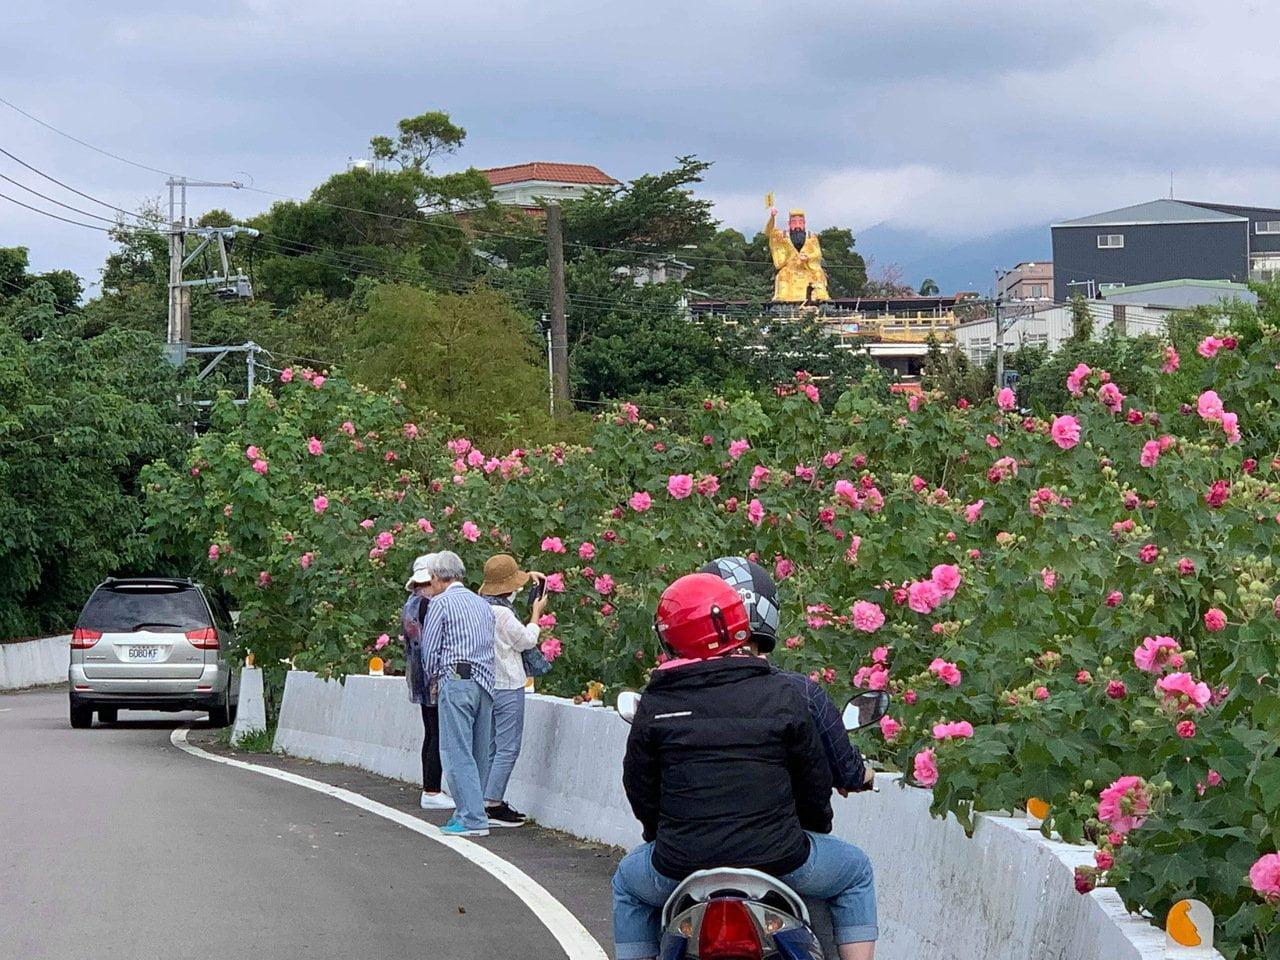 淡水櫻花季 天元宮 2/27-3/31 交通管制 公車接駁 停車場資訊 Hibiscus mutabilis Flower N8 county road Tamsui